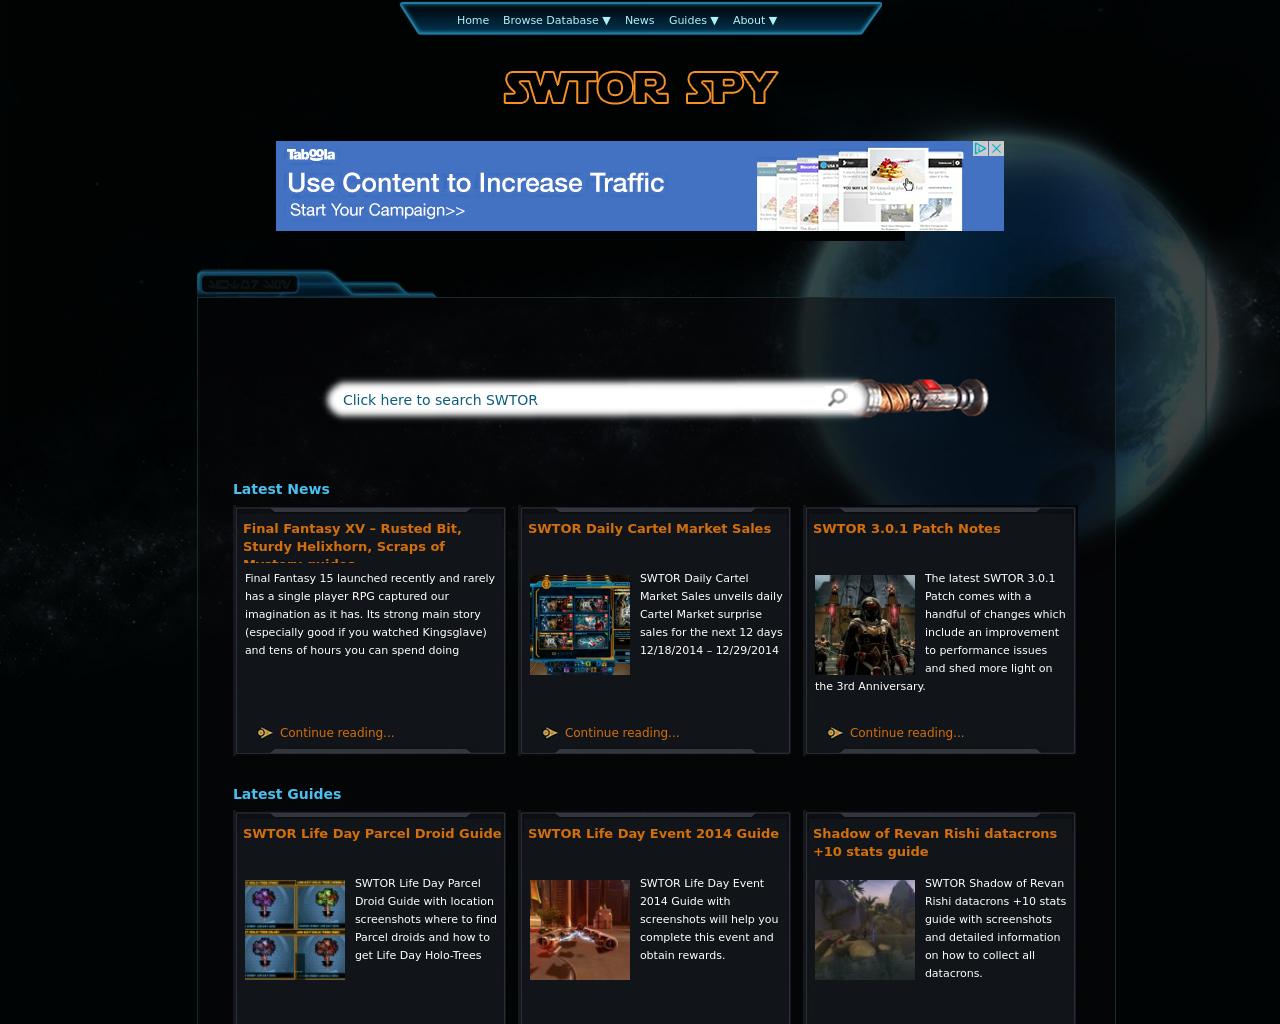 Swtor-Spy-Advertising-Reviews-Pricing